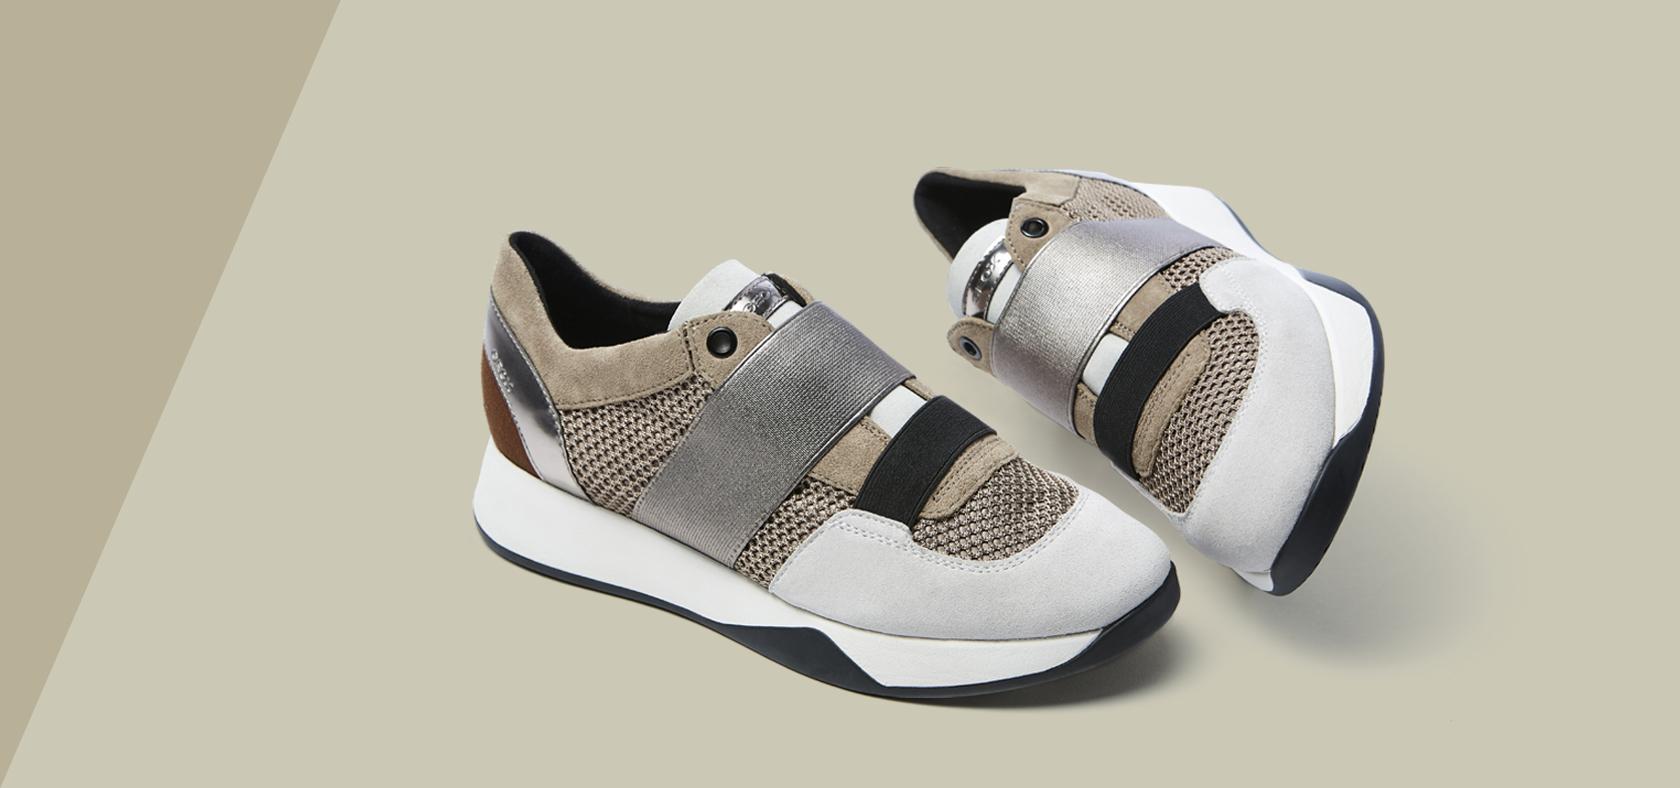 Chaussures Slip Sneakers OnConfortables Respirantes FemmeGeox 4A3Lq5jR